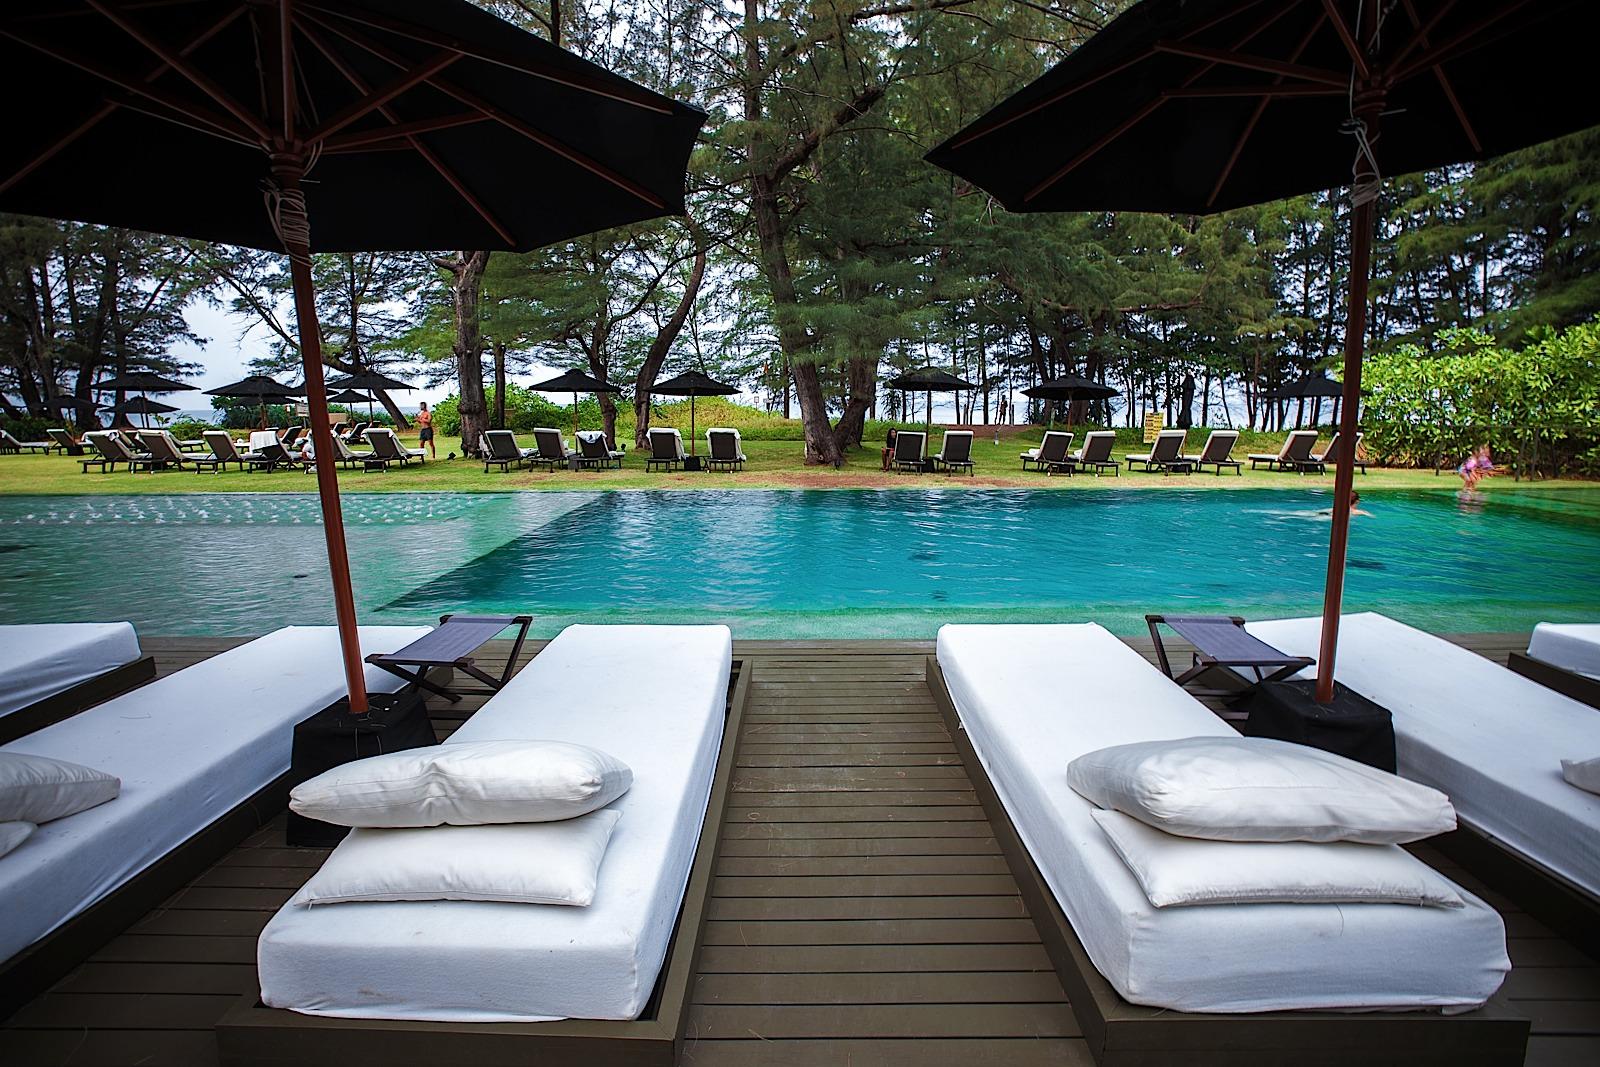 Sala phuket fitness workshop this weekend thai spas now for Hotel sala phuket